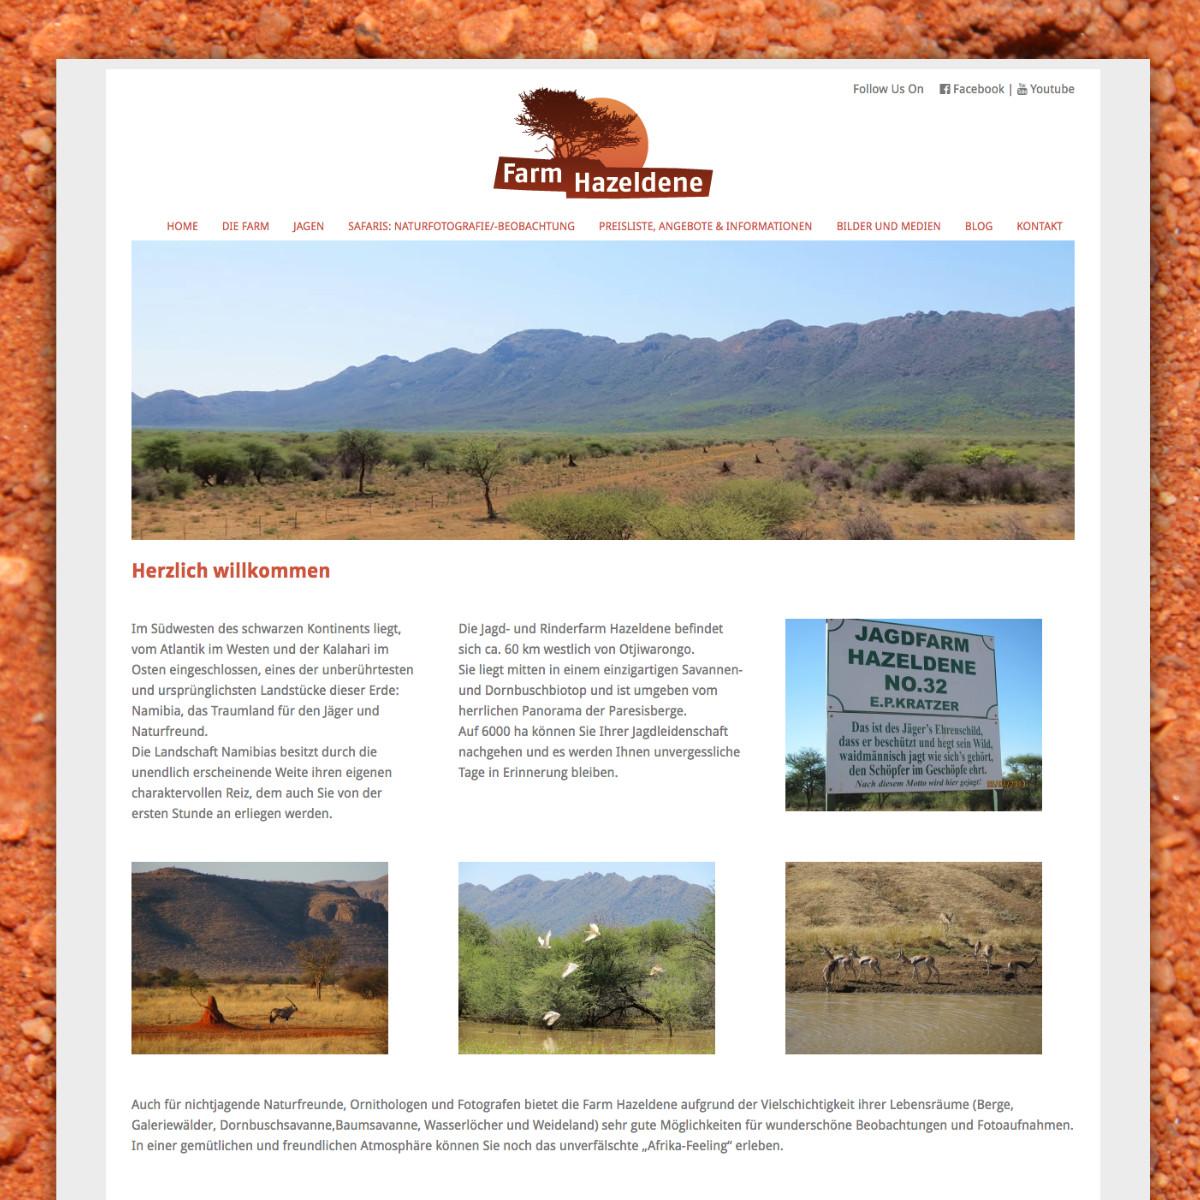 Website für Farm Hazeldene in Namibia